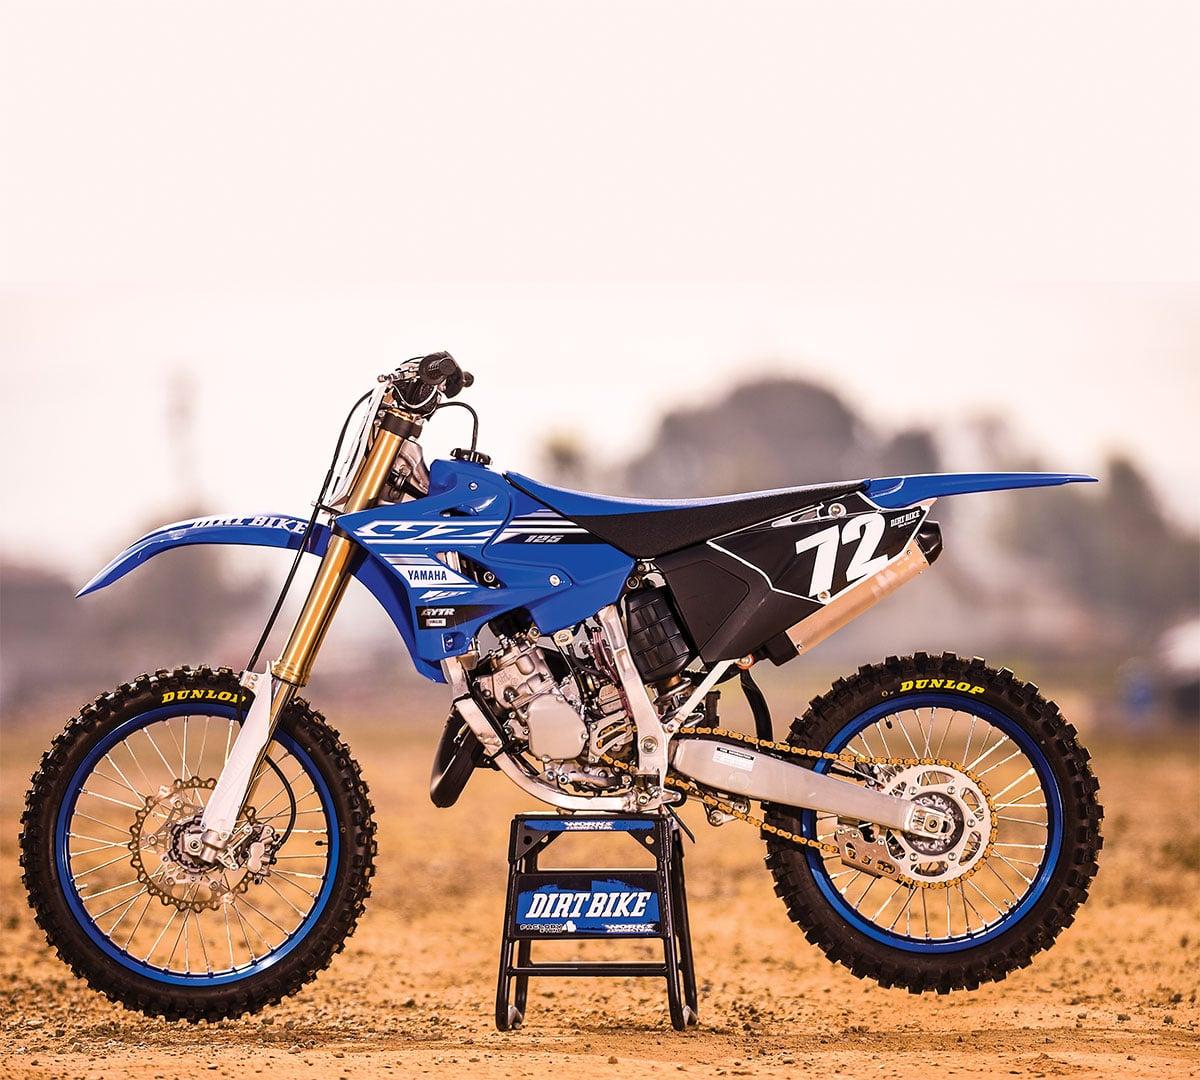 2019 YAMAHA YZ125 GUIDE   Dirt Bike Magazine